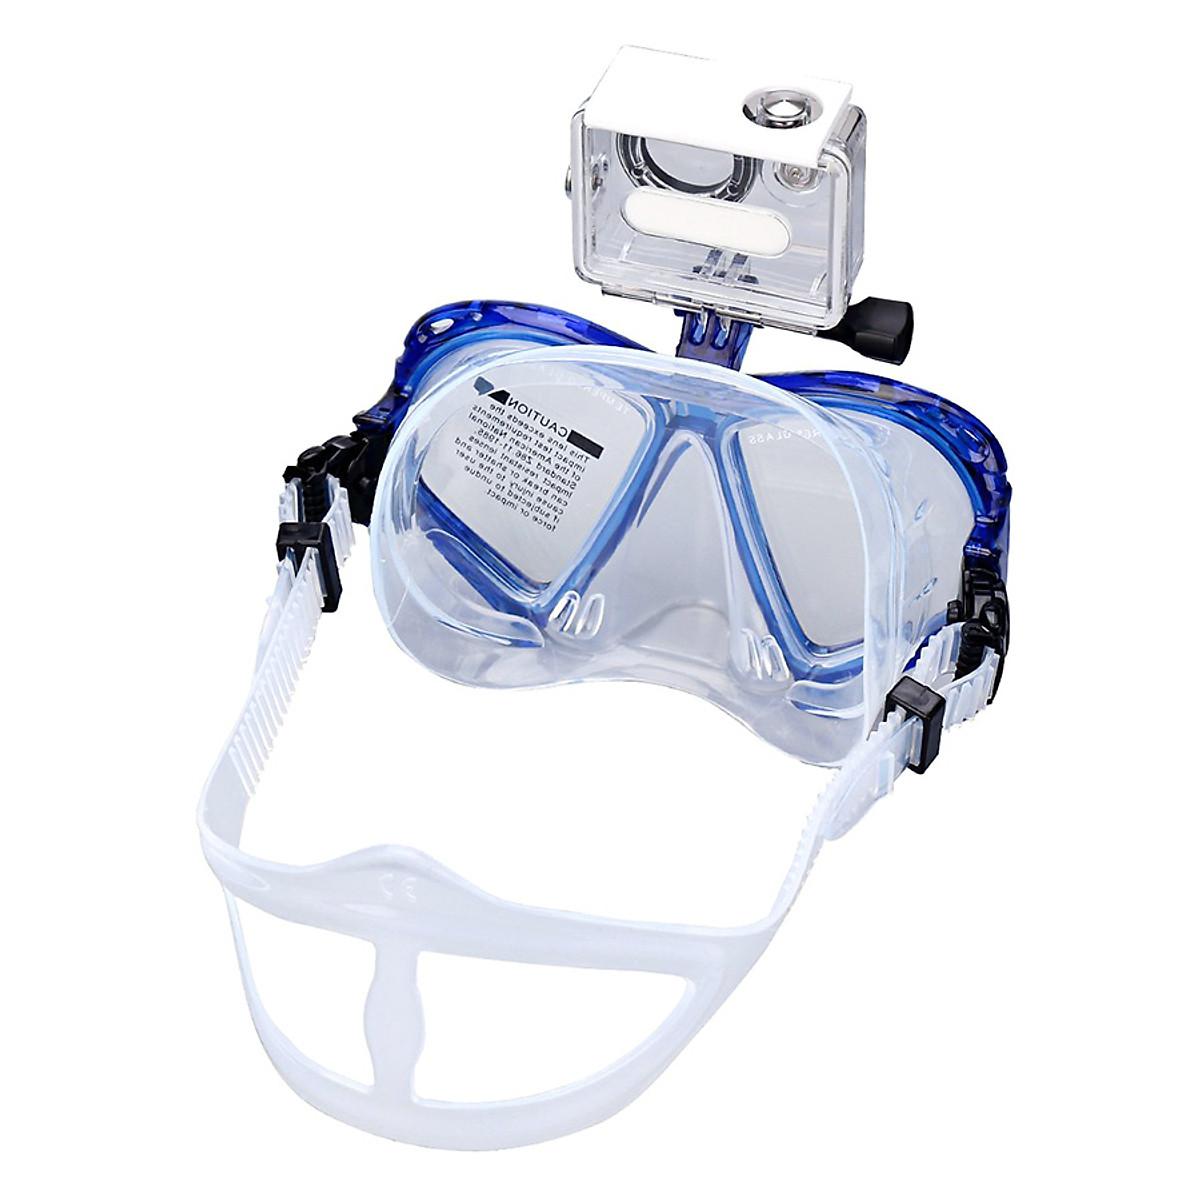 Kính Lặn Cường Lực Gắn Được Gopro POPO Swim-Mask Gopro-Blue - 1